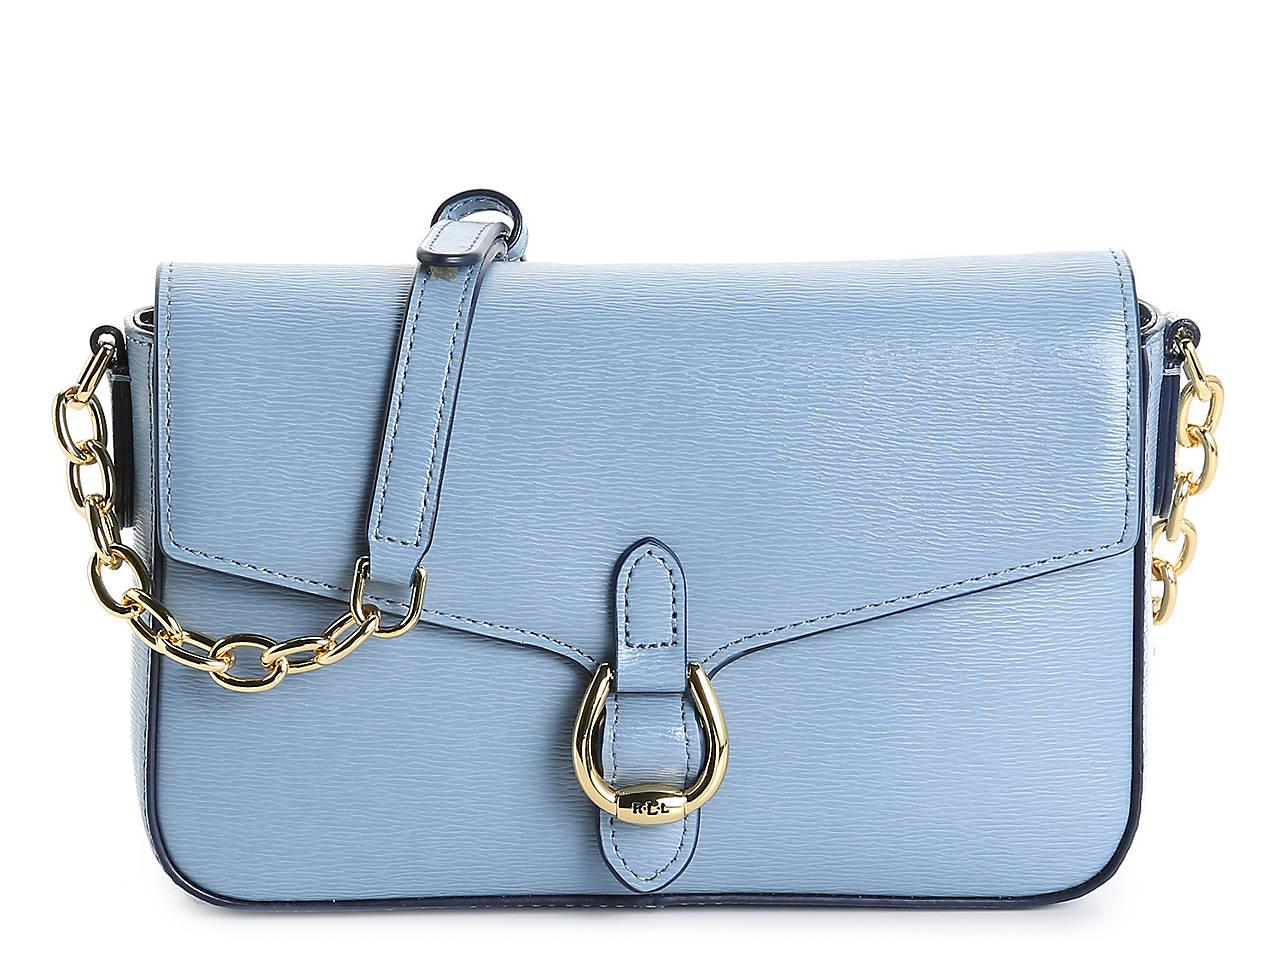 32cc4b074 Lauren Ralph Lauren Bennington Leather Crossbody Bag Women's ...